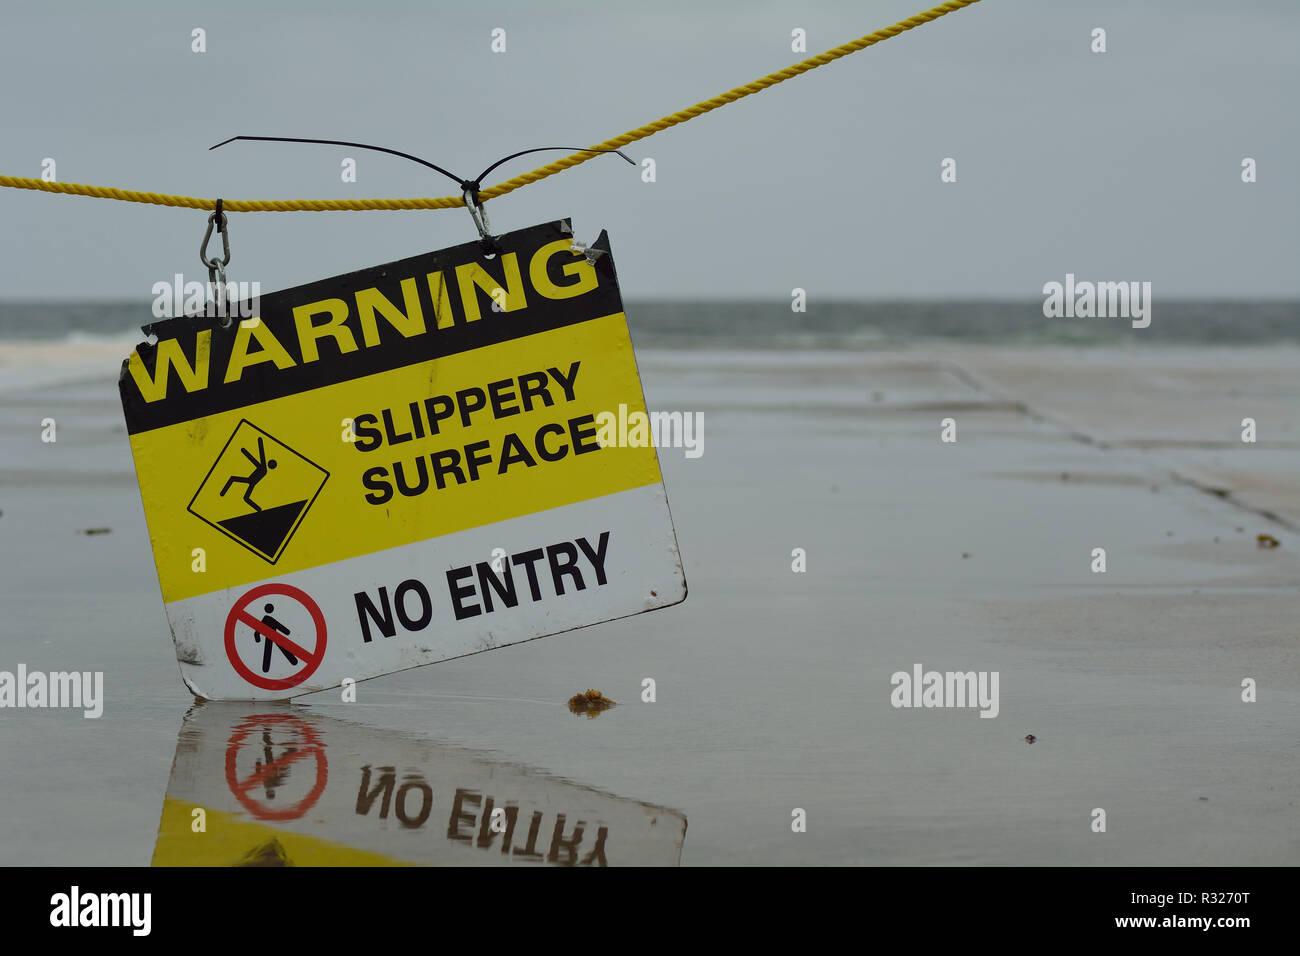 Slippery Surface Warning Sign - Stock Image